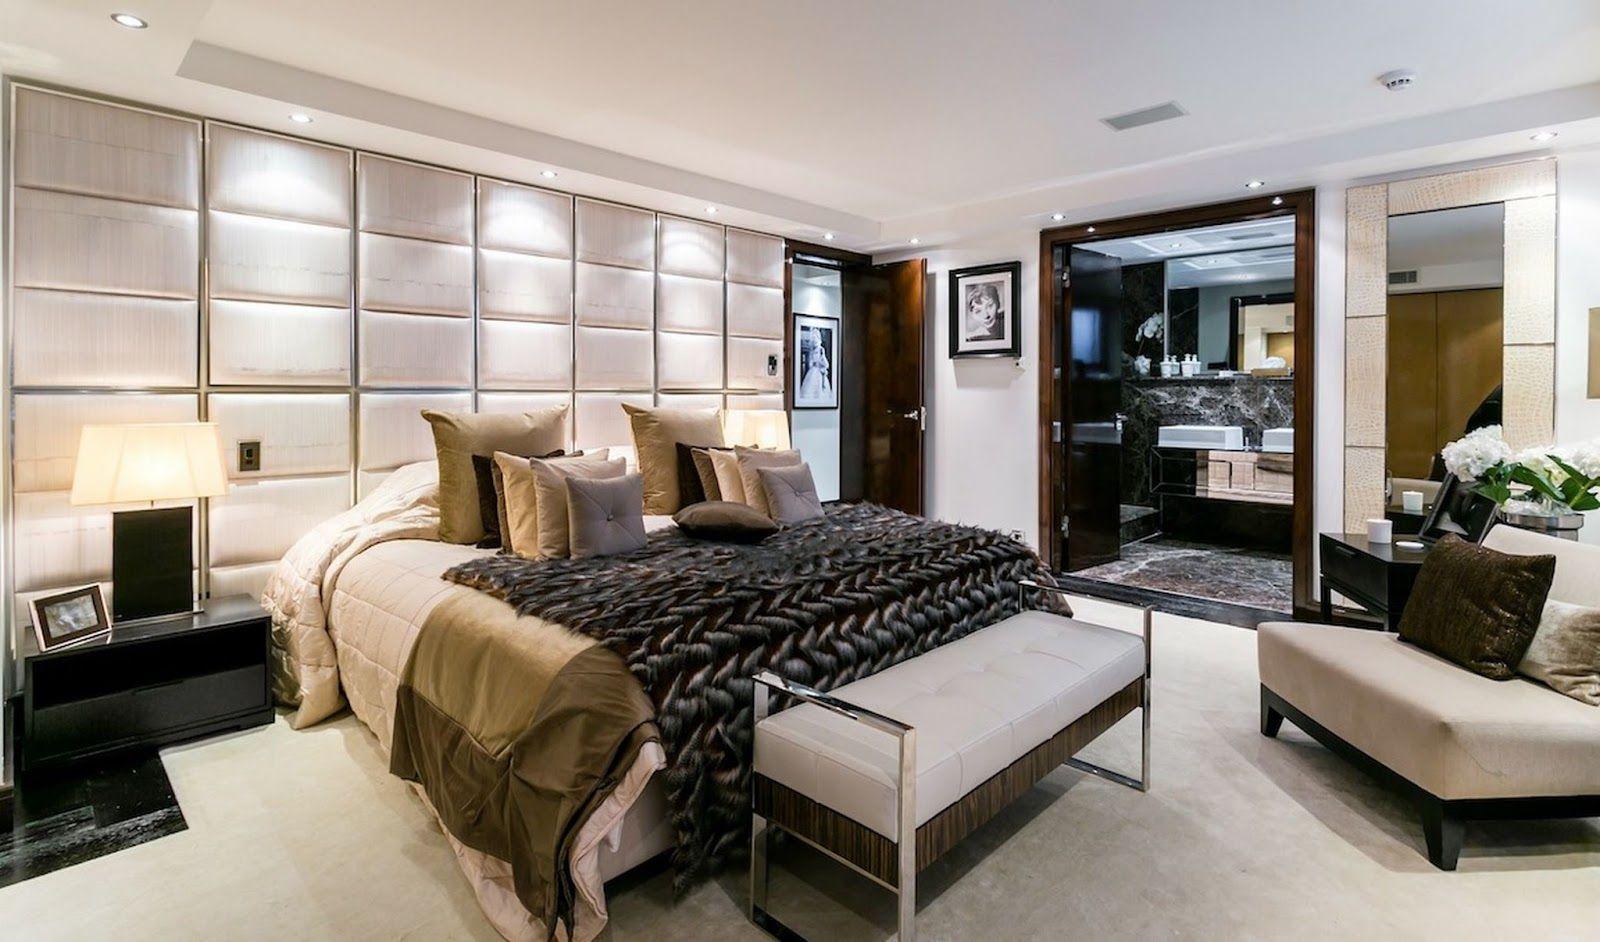 celebrity homes rihanna tom cruise a iní penthouse in london